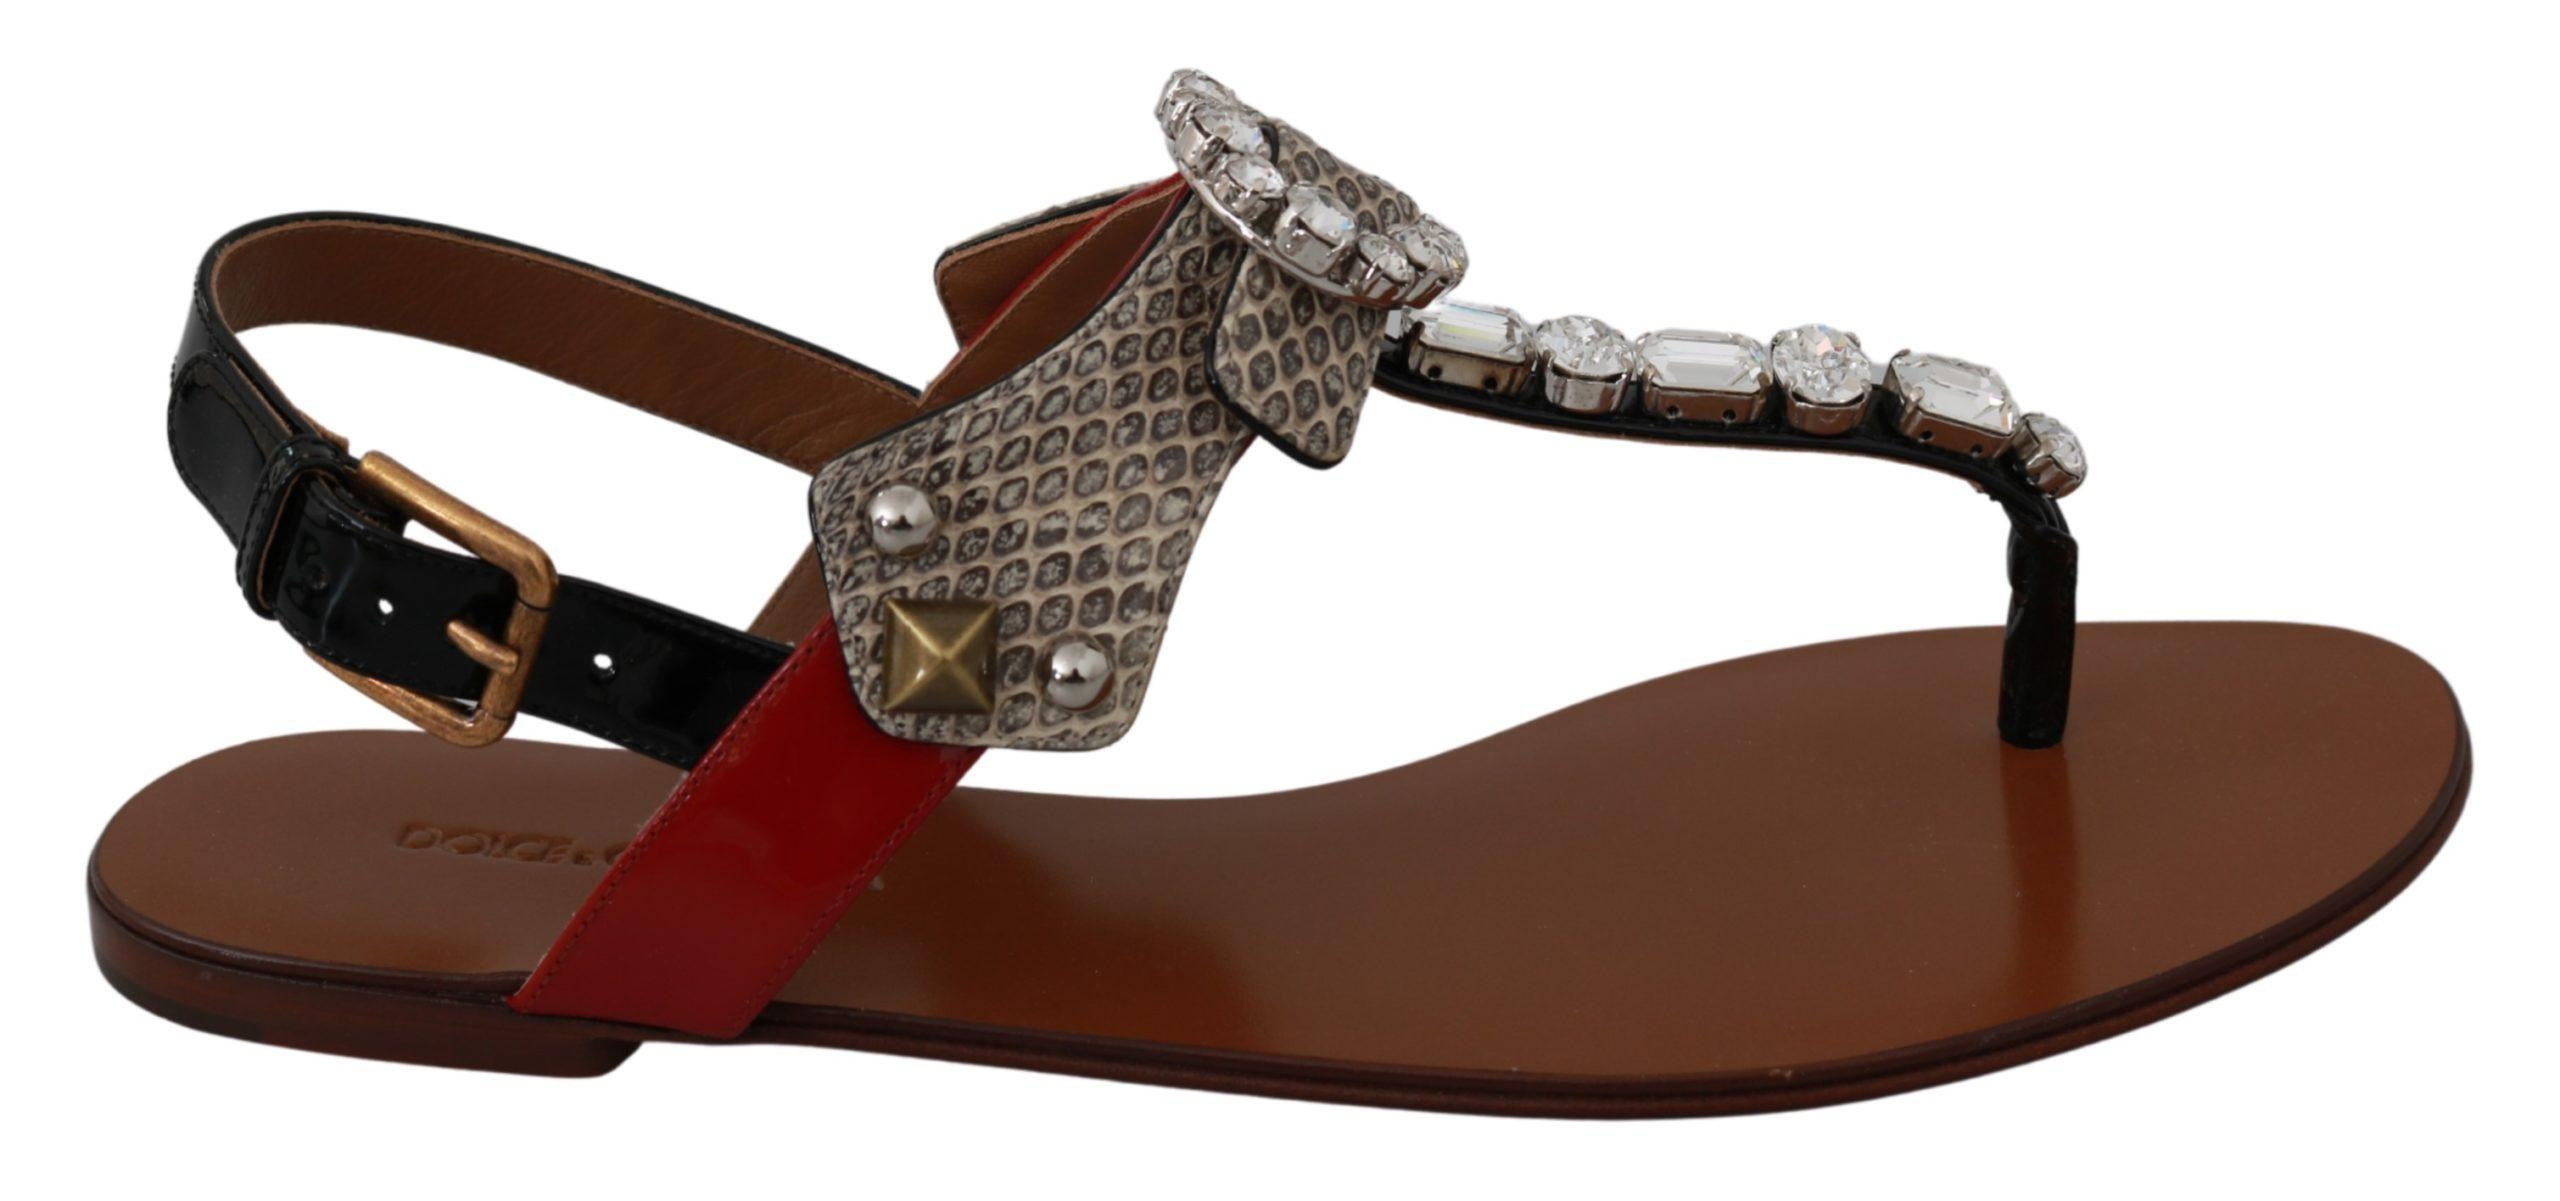 Dolce & Gabbana Women's Leather Ayers Crystal Sandal Brown LA6458 - EU35/US4.5